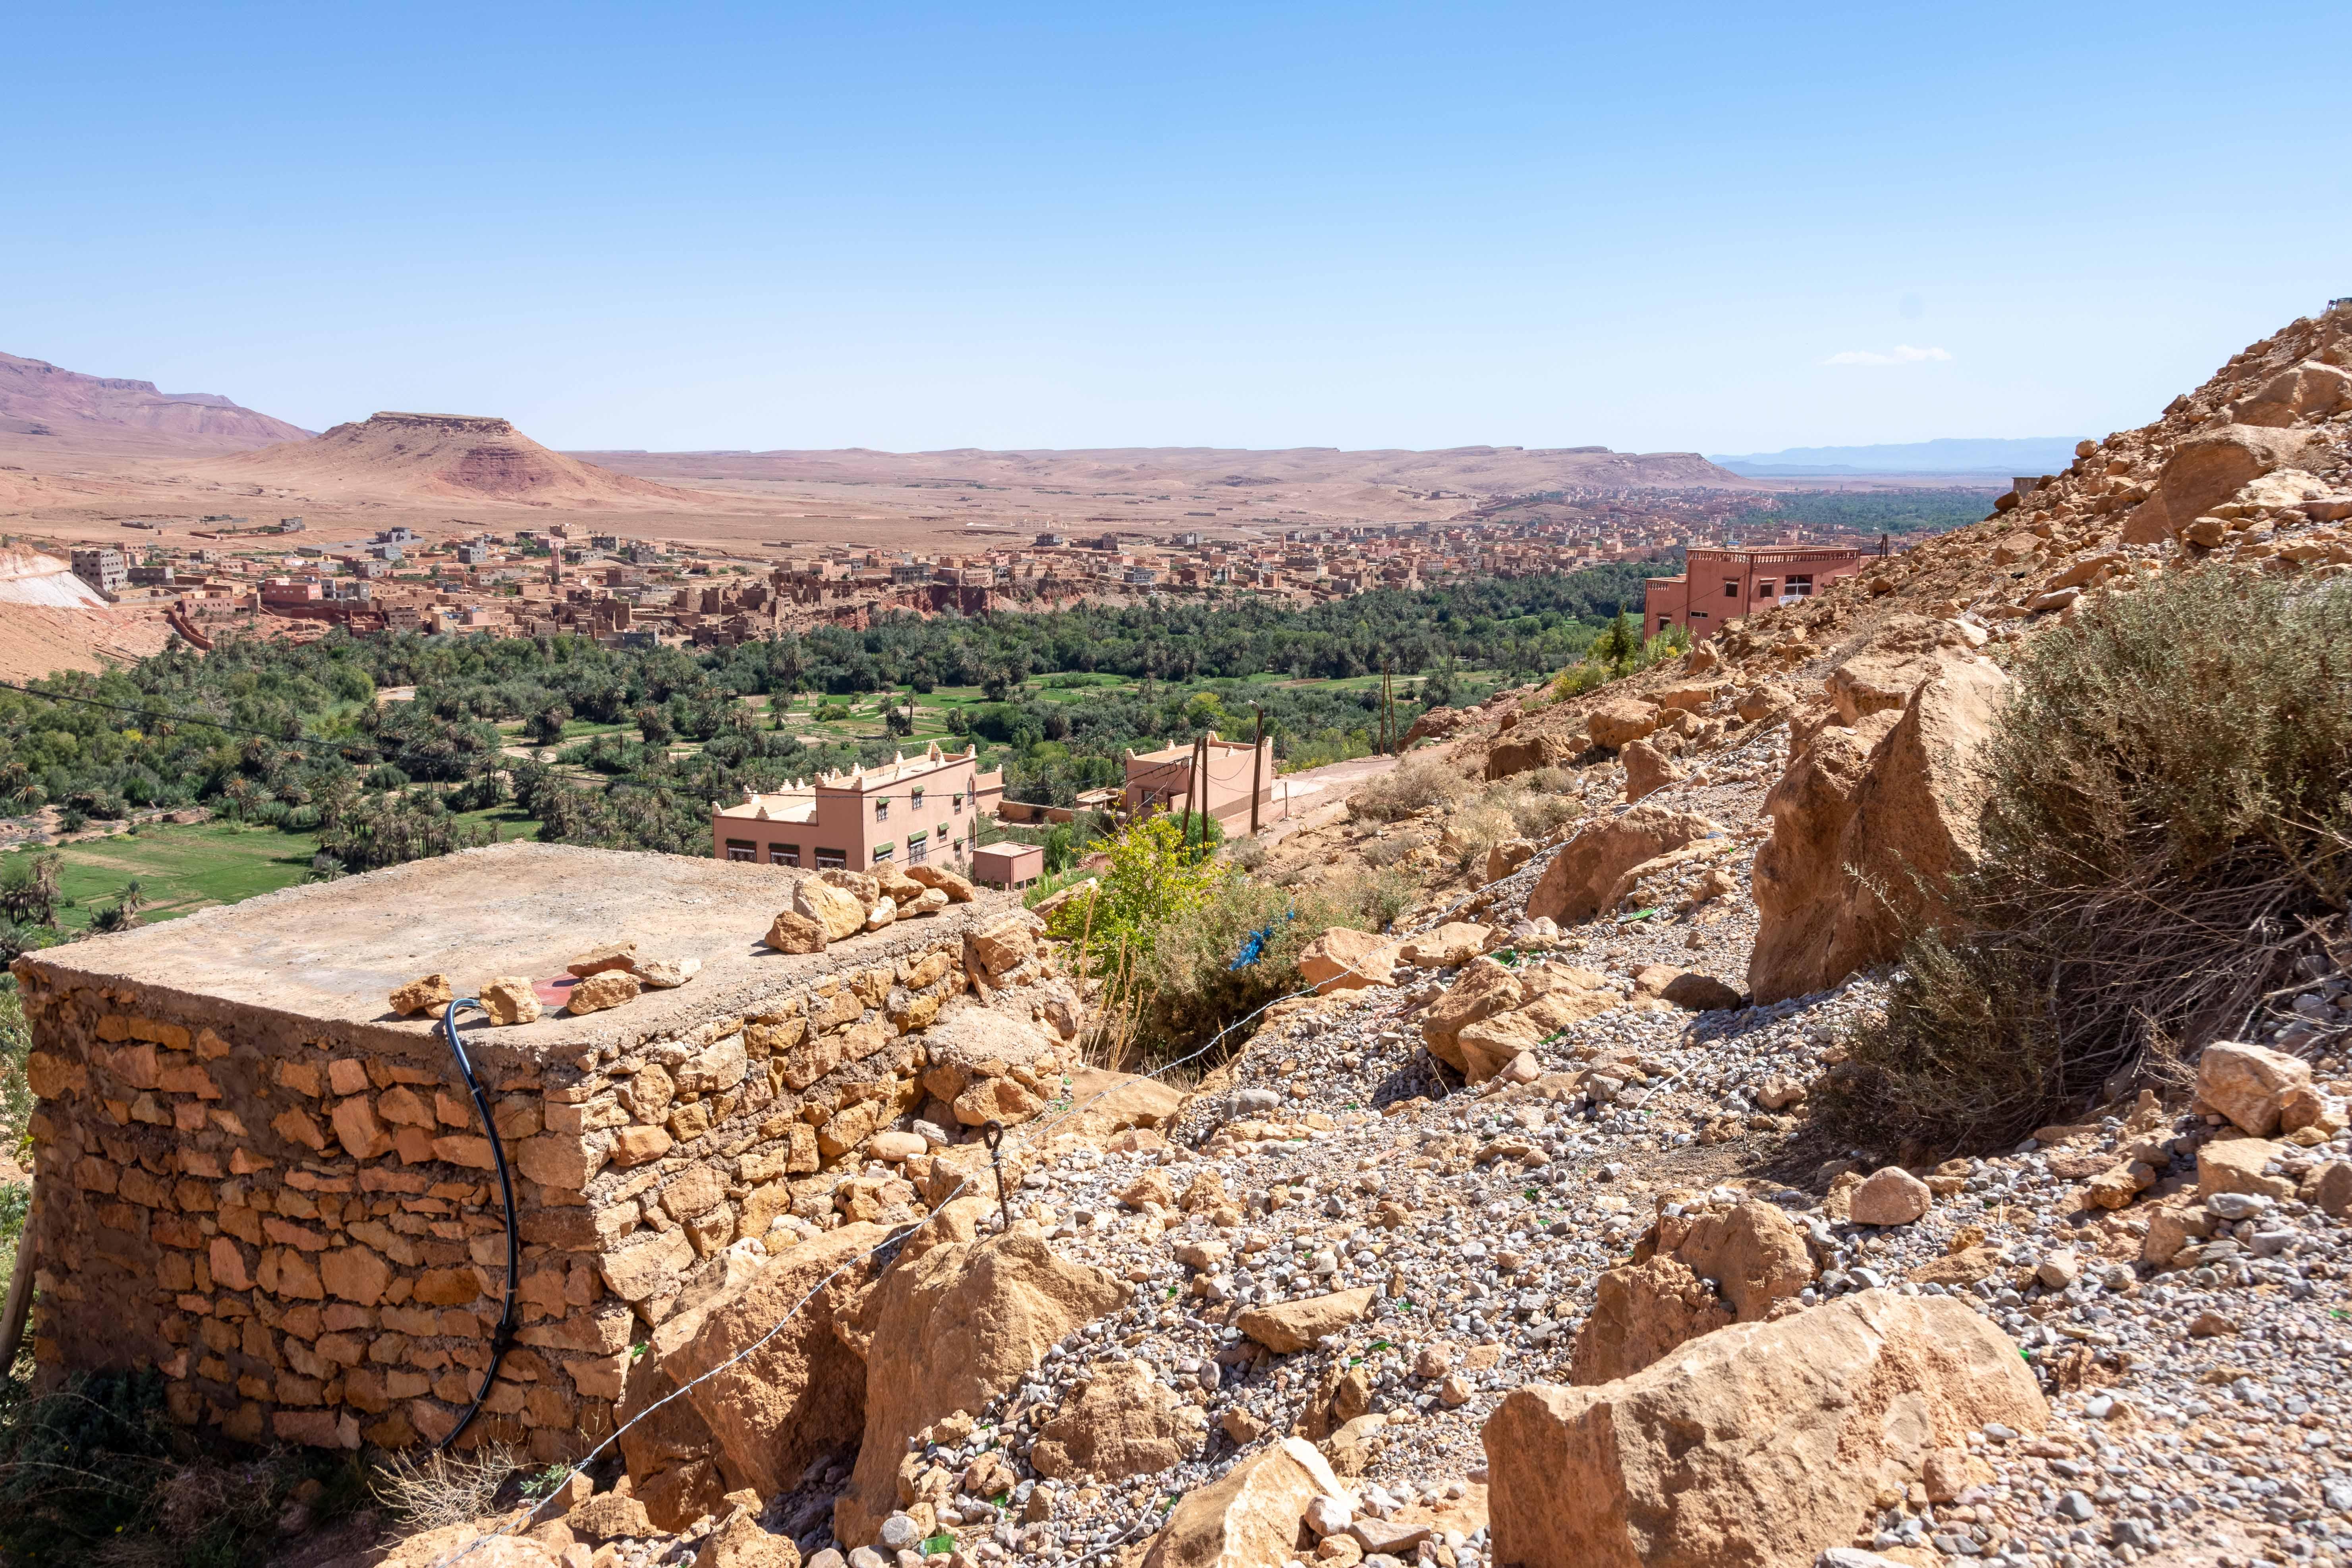 20181005_Marokko_118